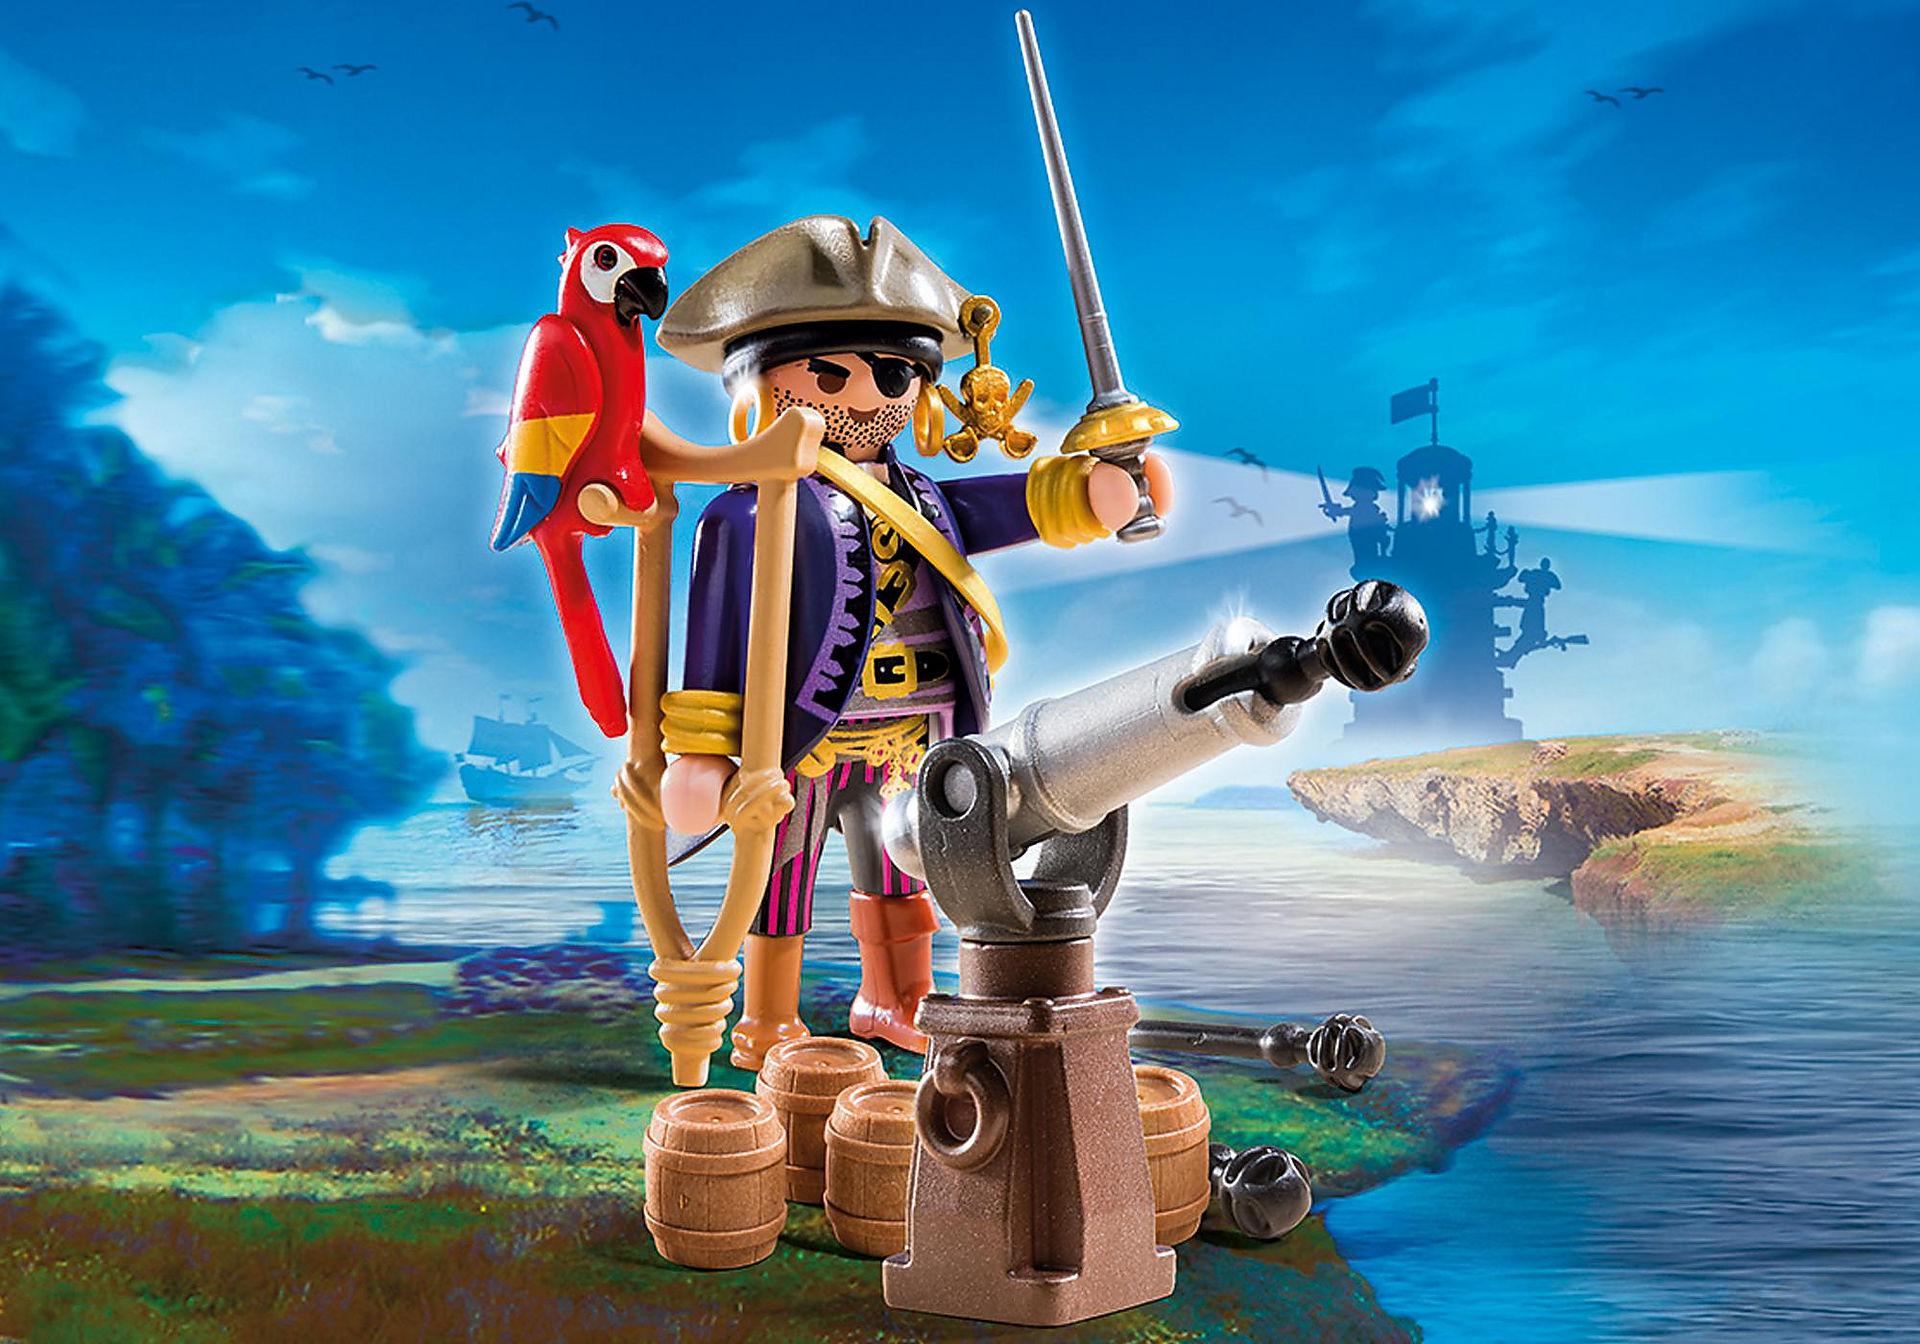 http://media.playmobil.com/i/playmobil/6684_product_detail/Capitaine pirate avec canon